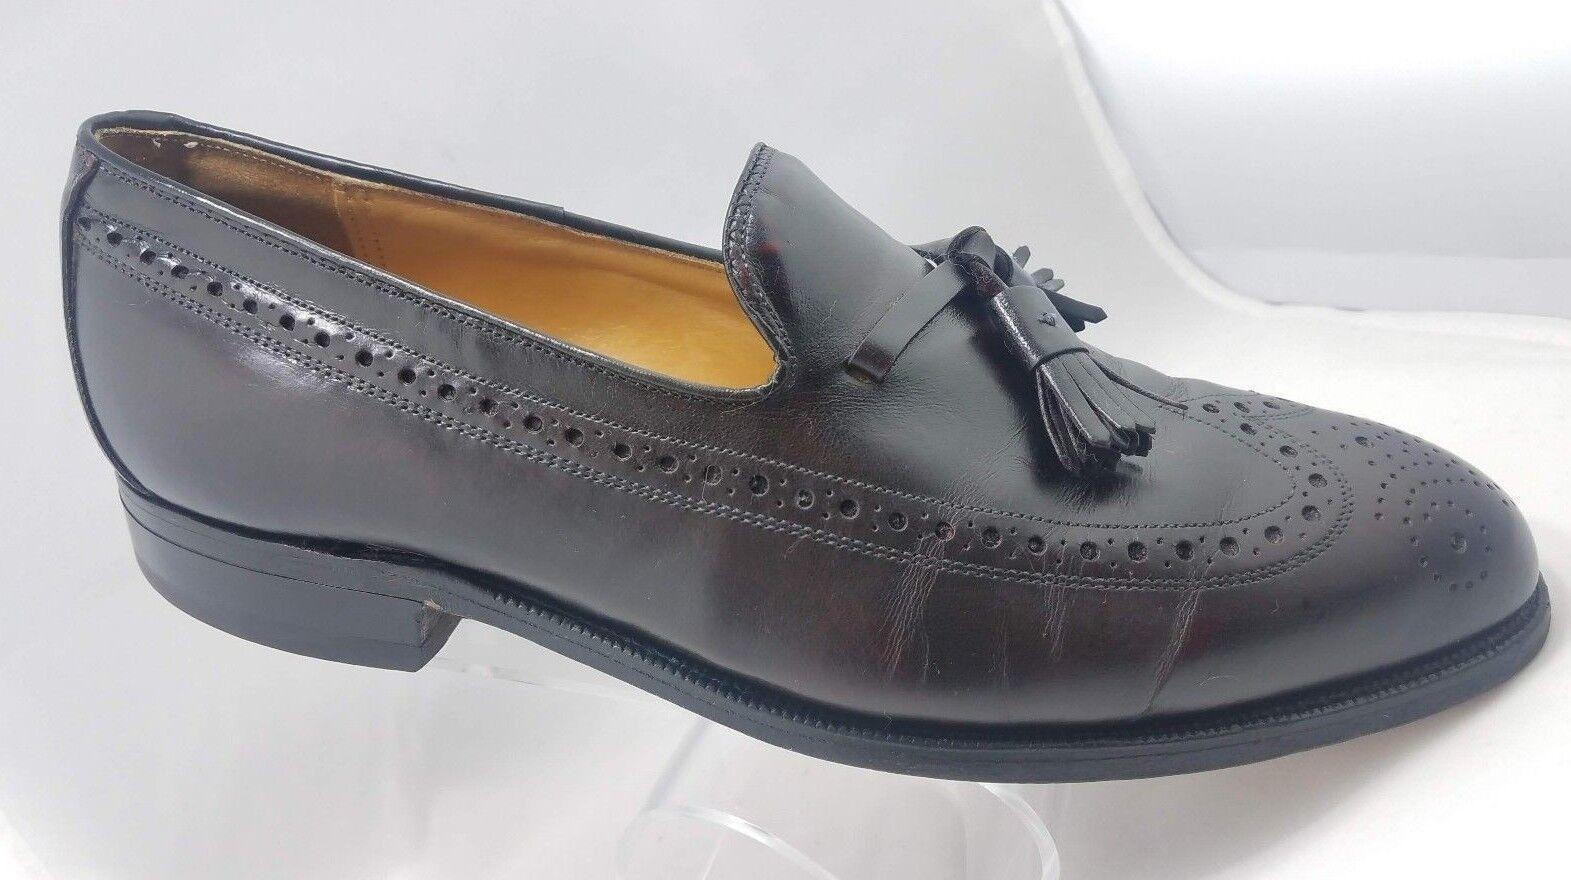 Johnston Murphy Aristocraft Burgundy Leather Slip on Wingtip Loafers Mens 8 USA